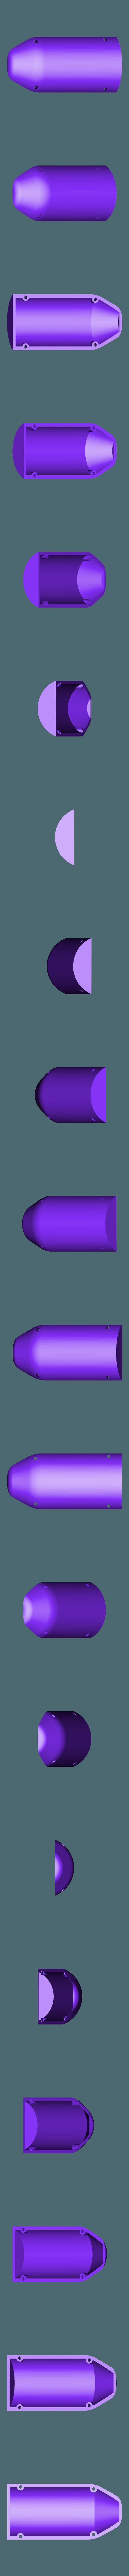 cover.stl Download free STL file Wind turbine for 775 engine • 3D printer template, LetsPrintYT